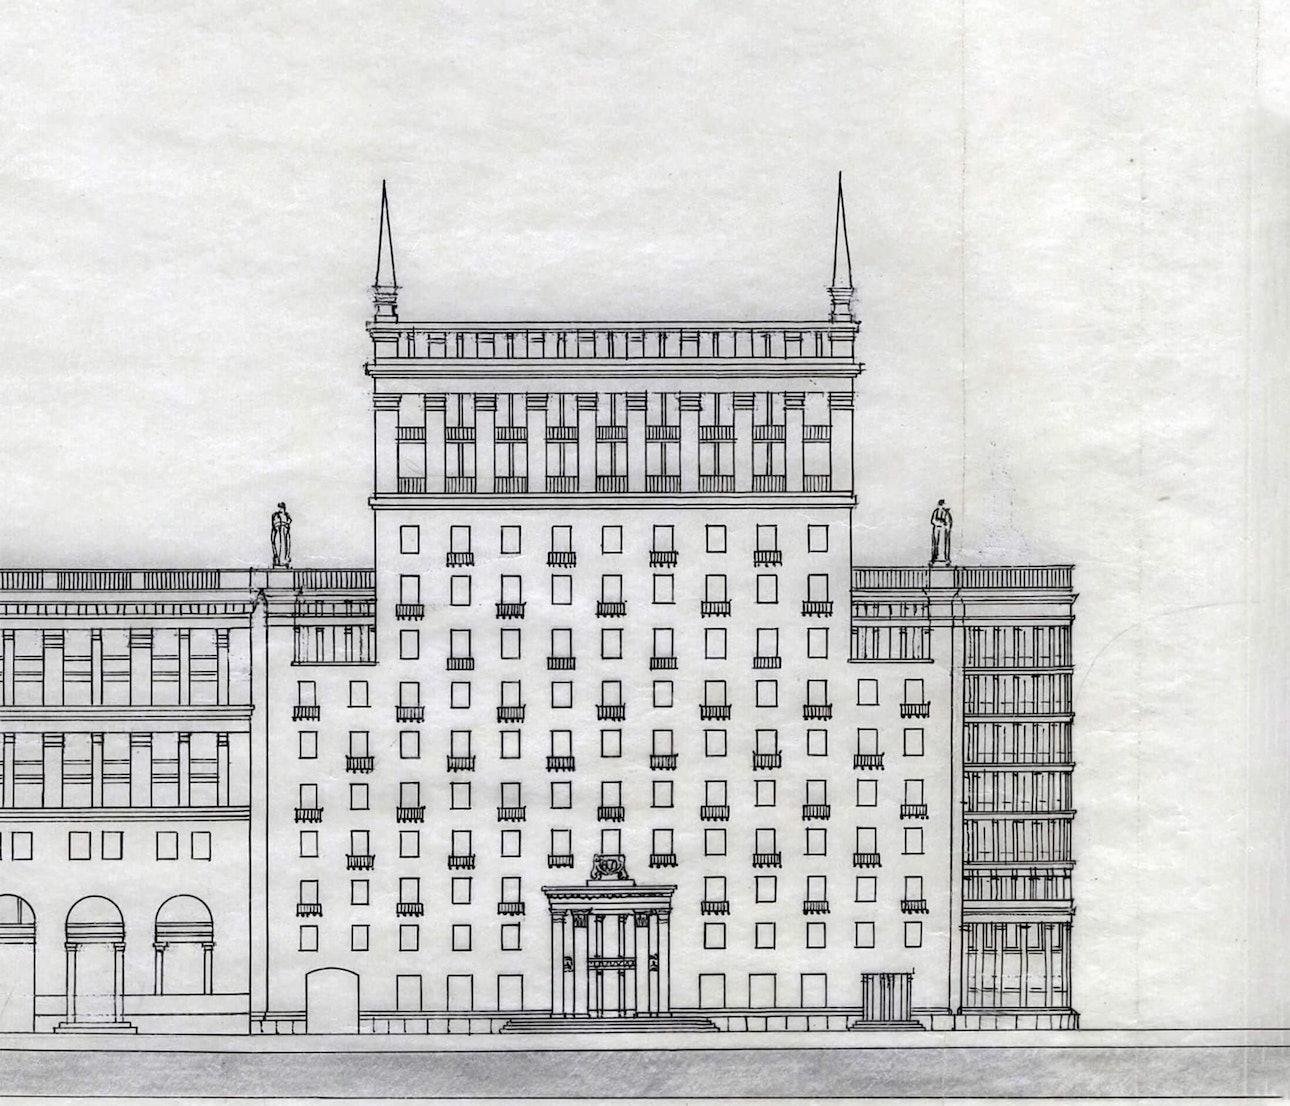 new_1954-11-10 Гостиница Днепр. ЦДНТА, 1-45-0329-2 - Copy_architecture_shirochin (1)